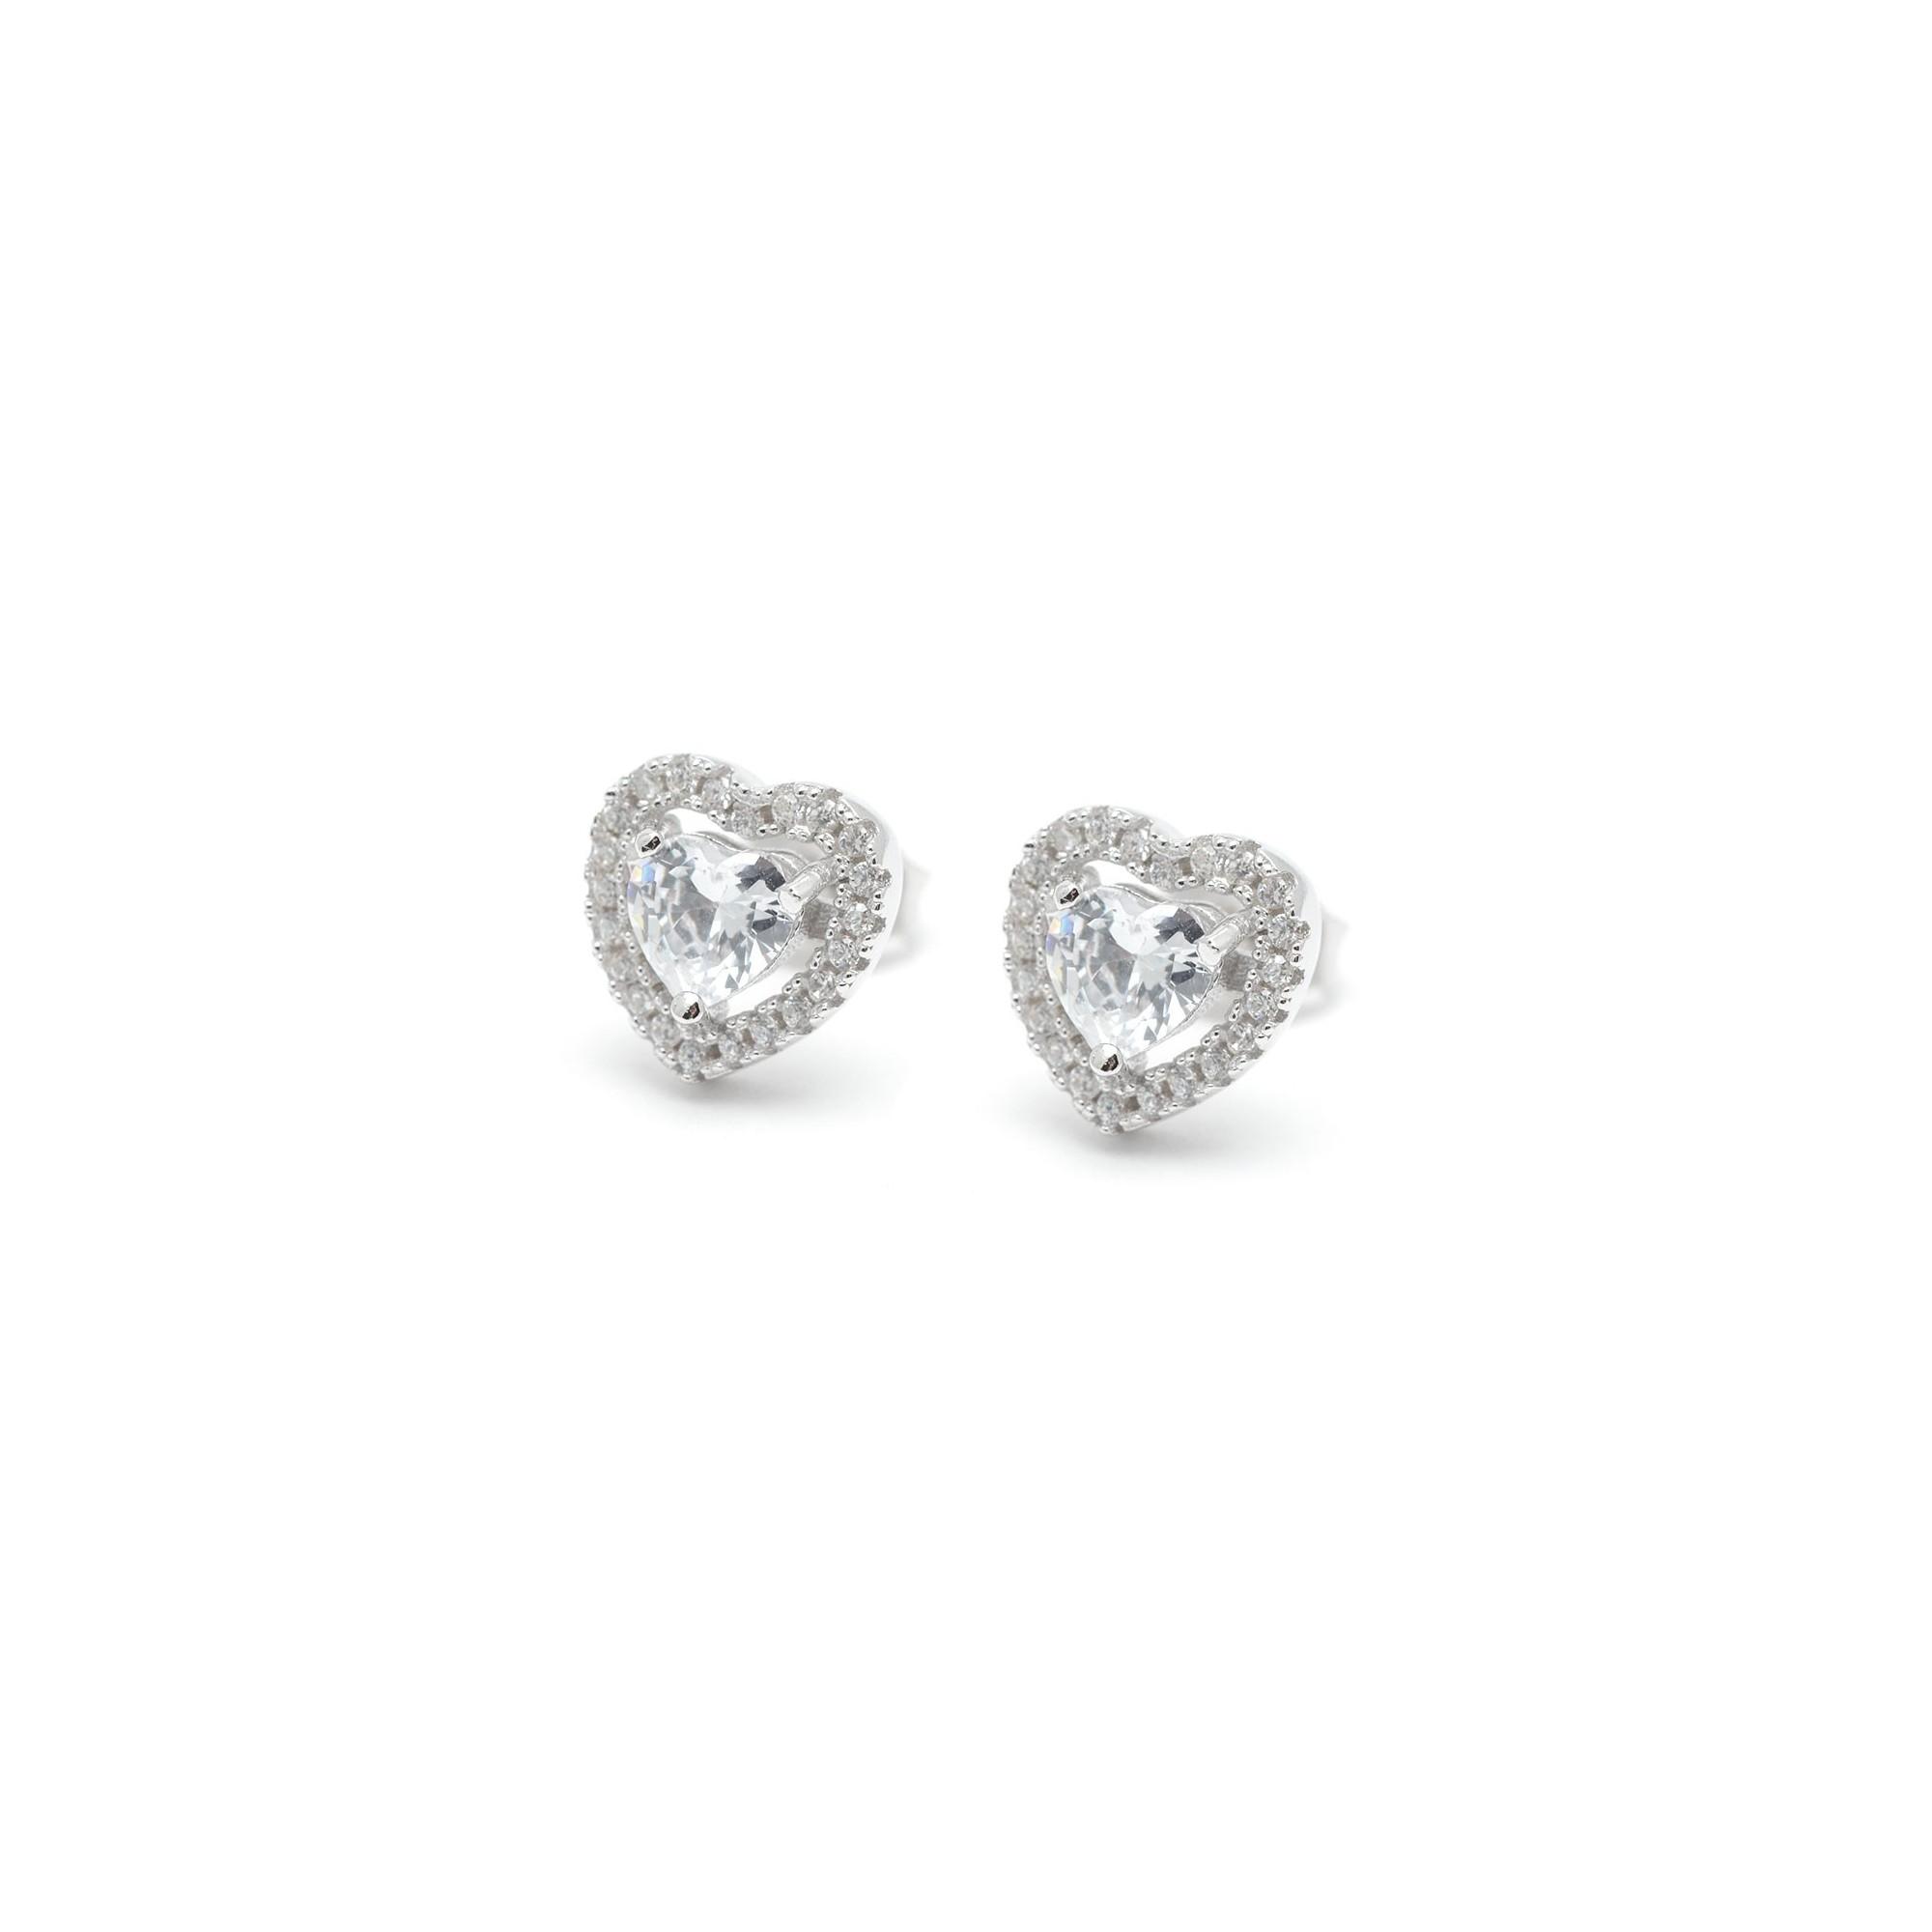 ahorrar b6122 d2dd2 Pendientes Plata Corazón Cristales